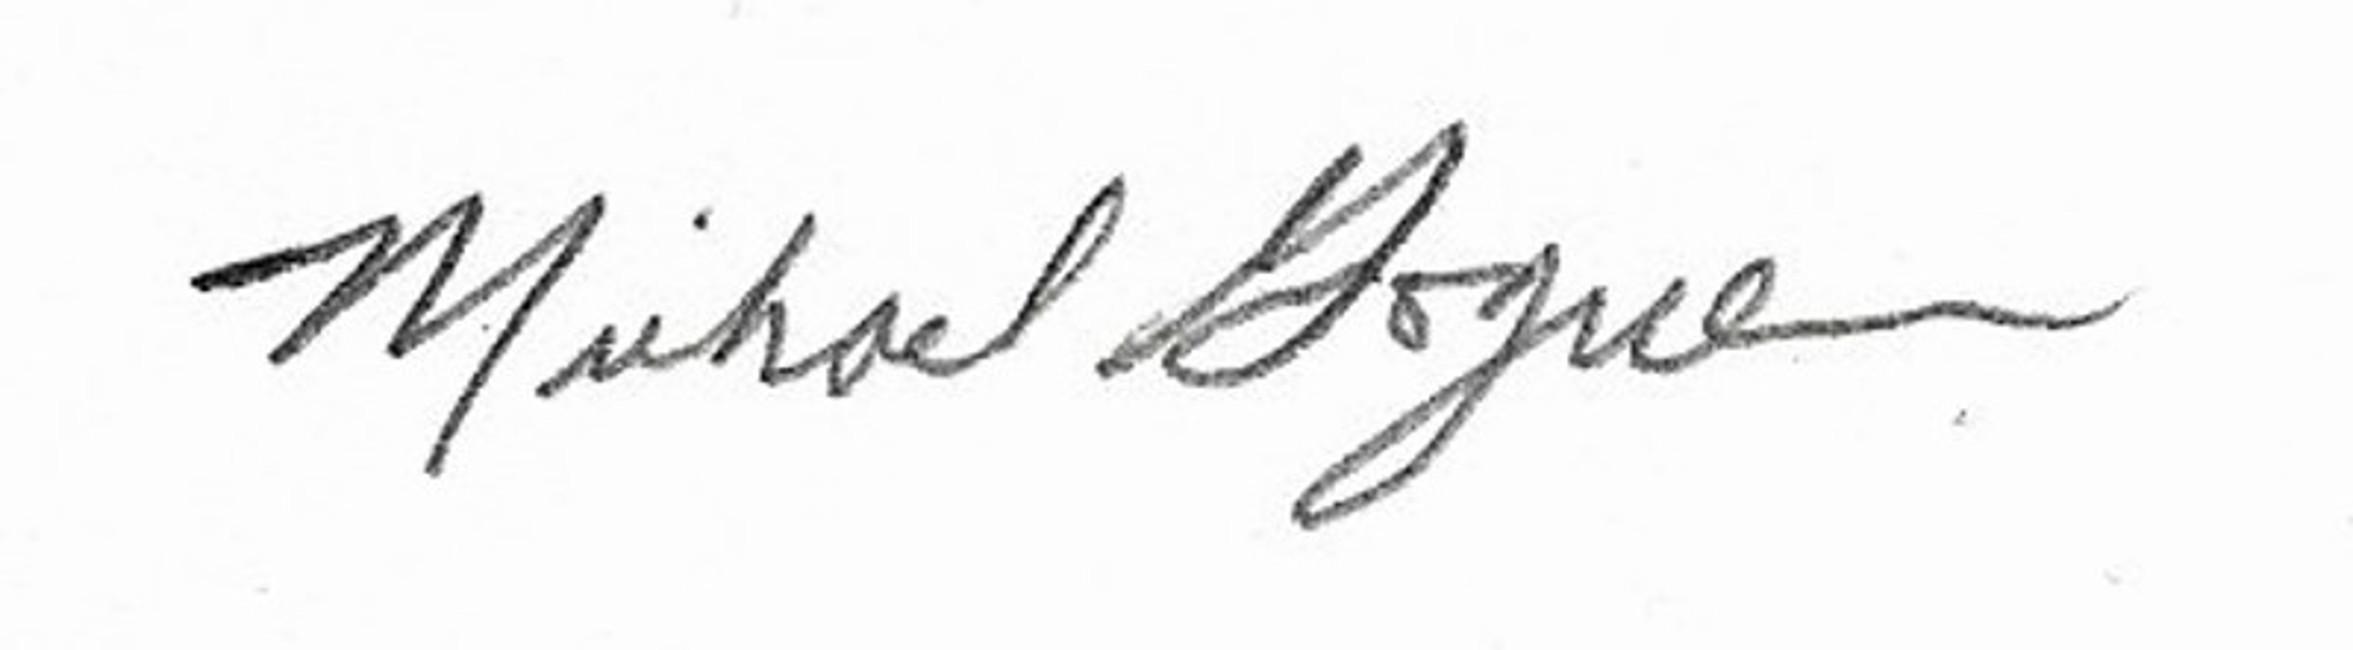 Michael Goguen's Signature